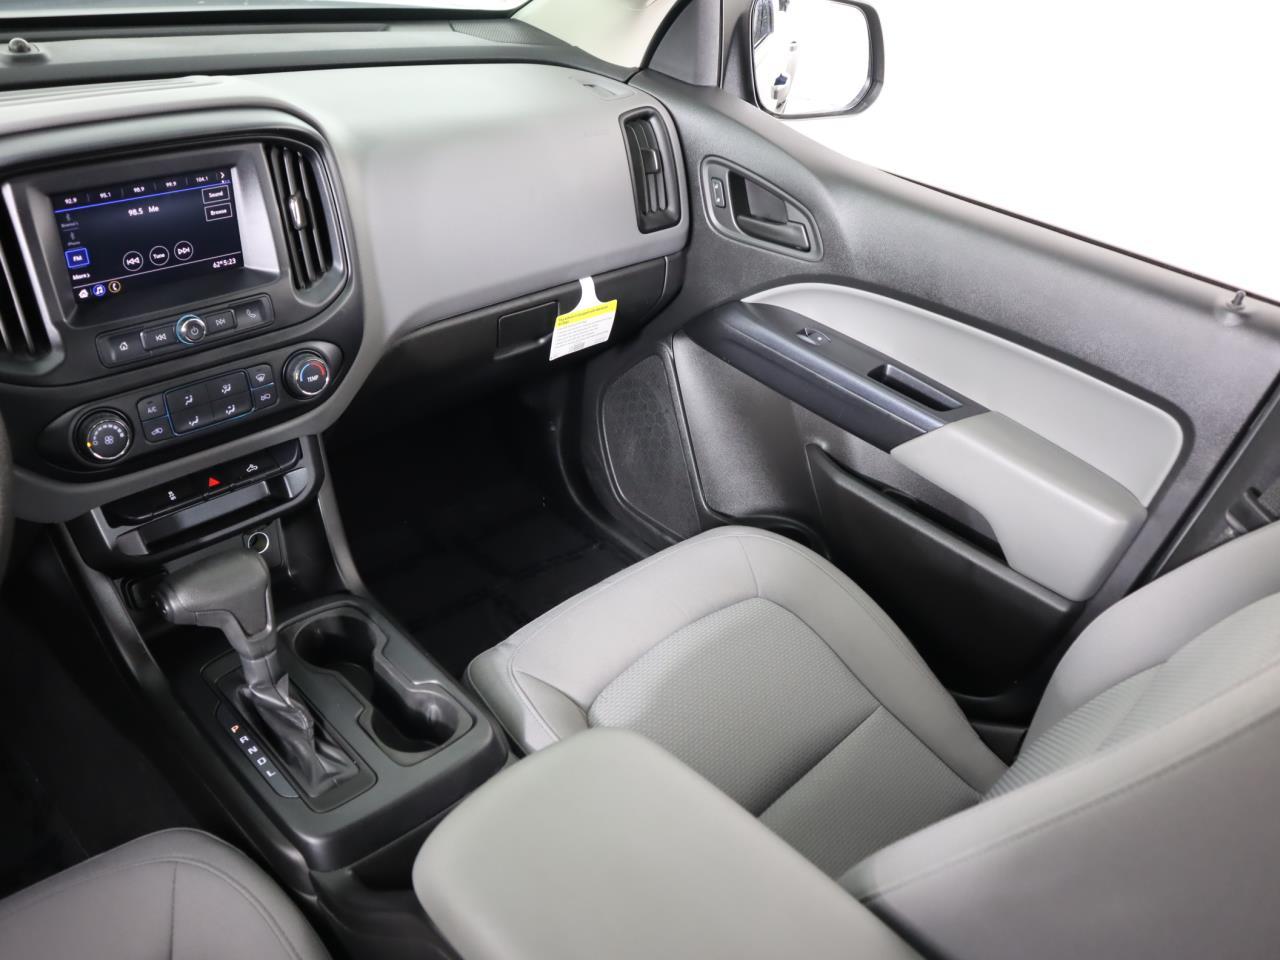 used vehicle - Truck CHEVROLET COLORADO 2020